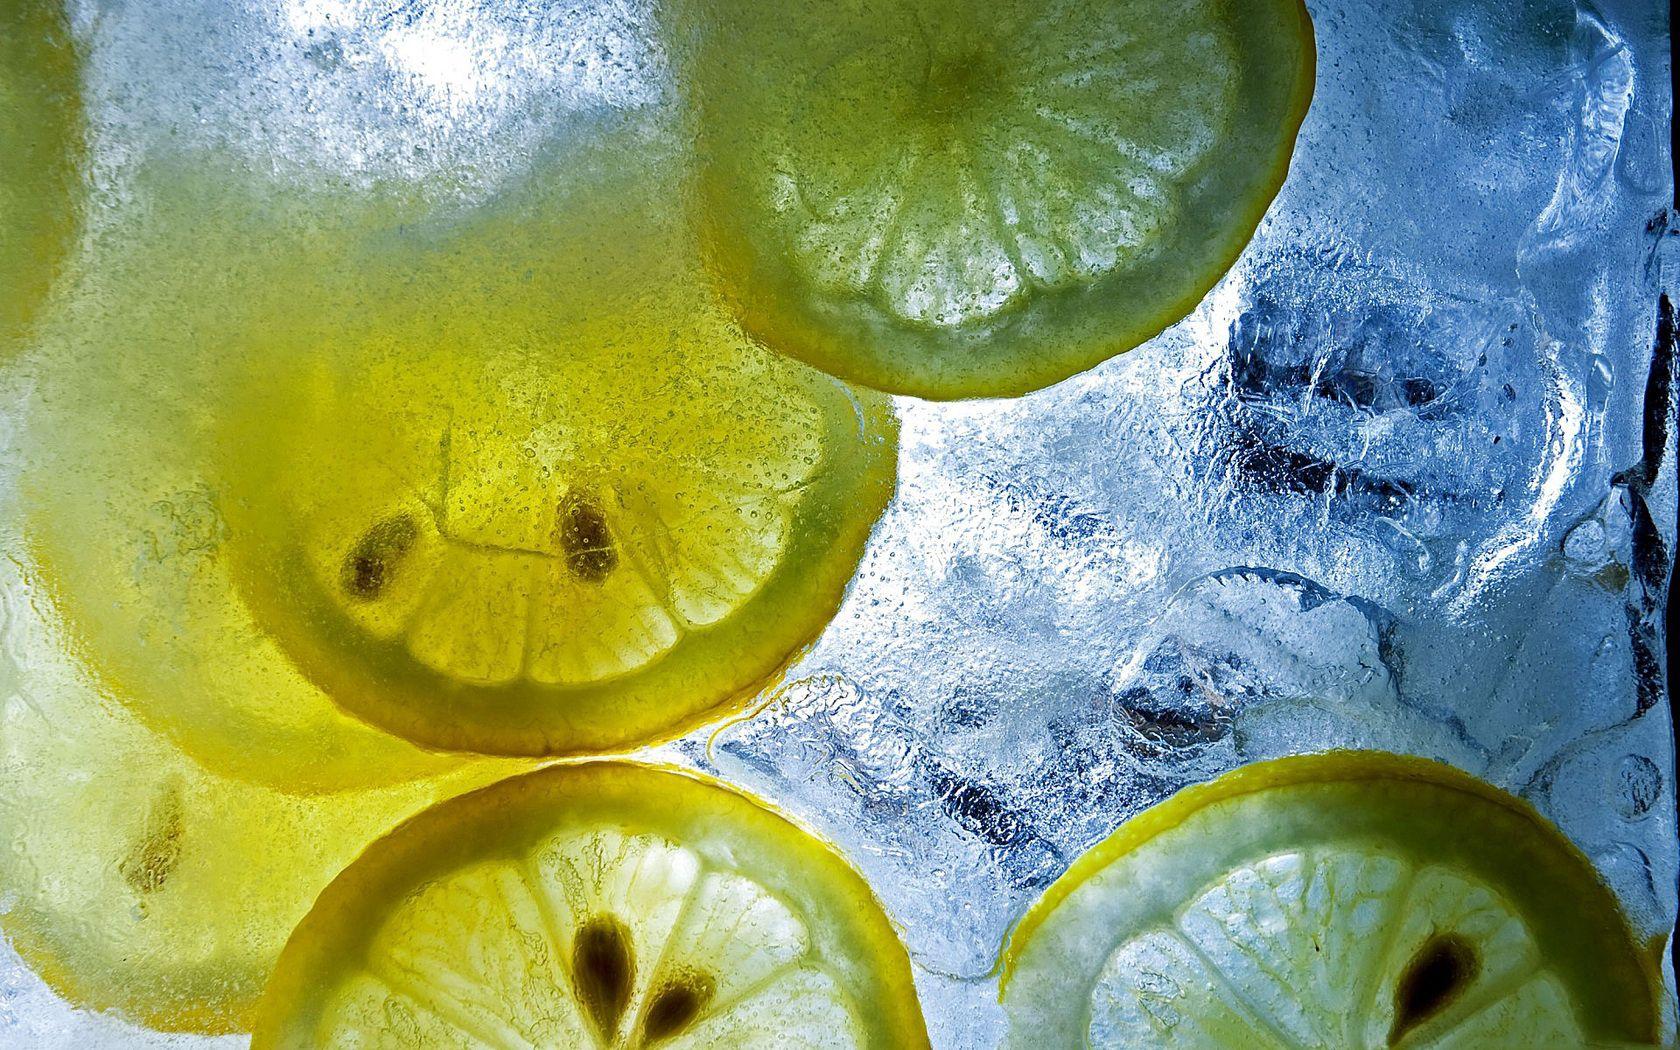 144135 Заставки и Обои Лед на телефон. Скачать Лед, Макро, Лимон, Цитрус, Кусочки картинки бесплатно